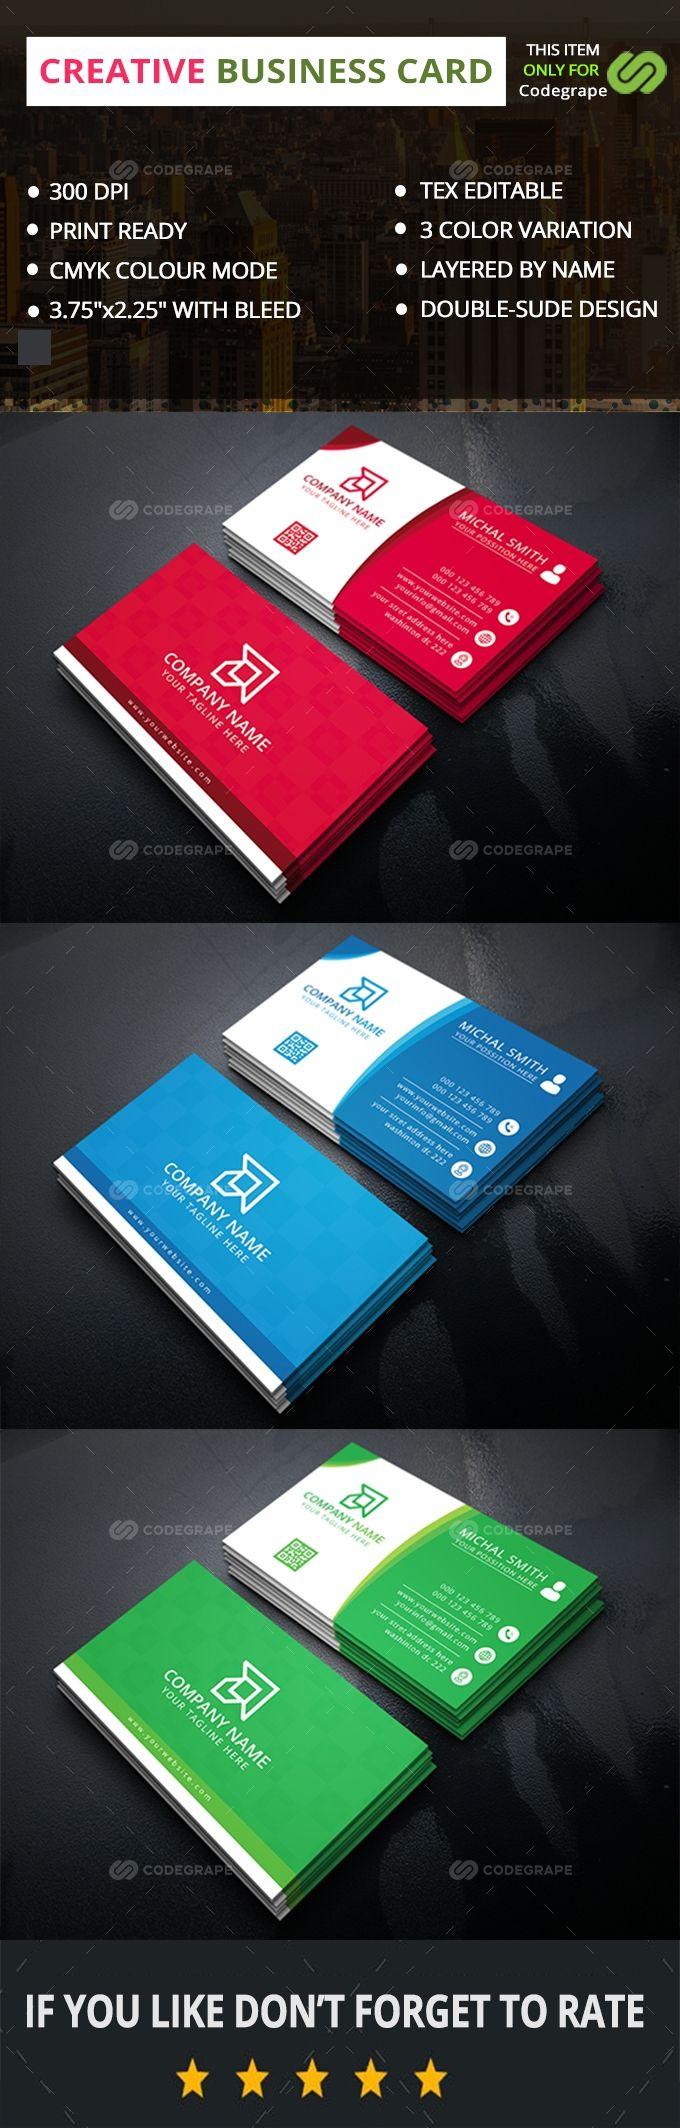 Watermark Design Business Cards Black Business Card Business Card Inspiration Business Card Design